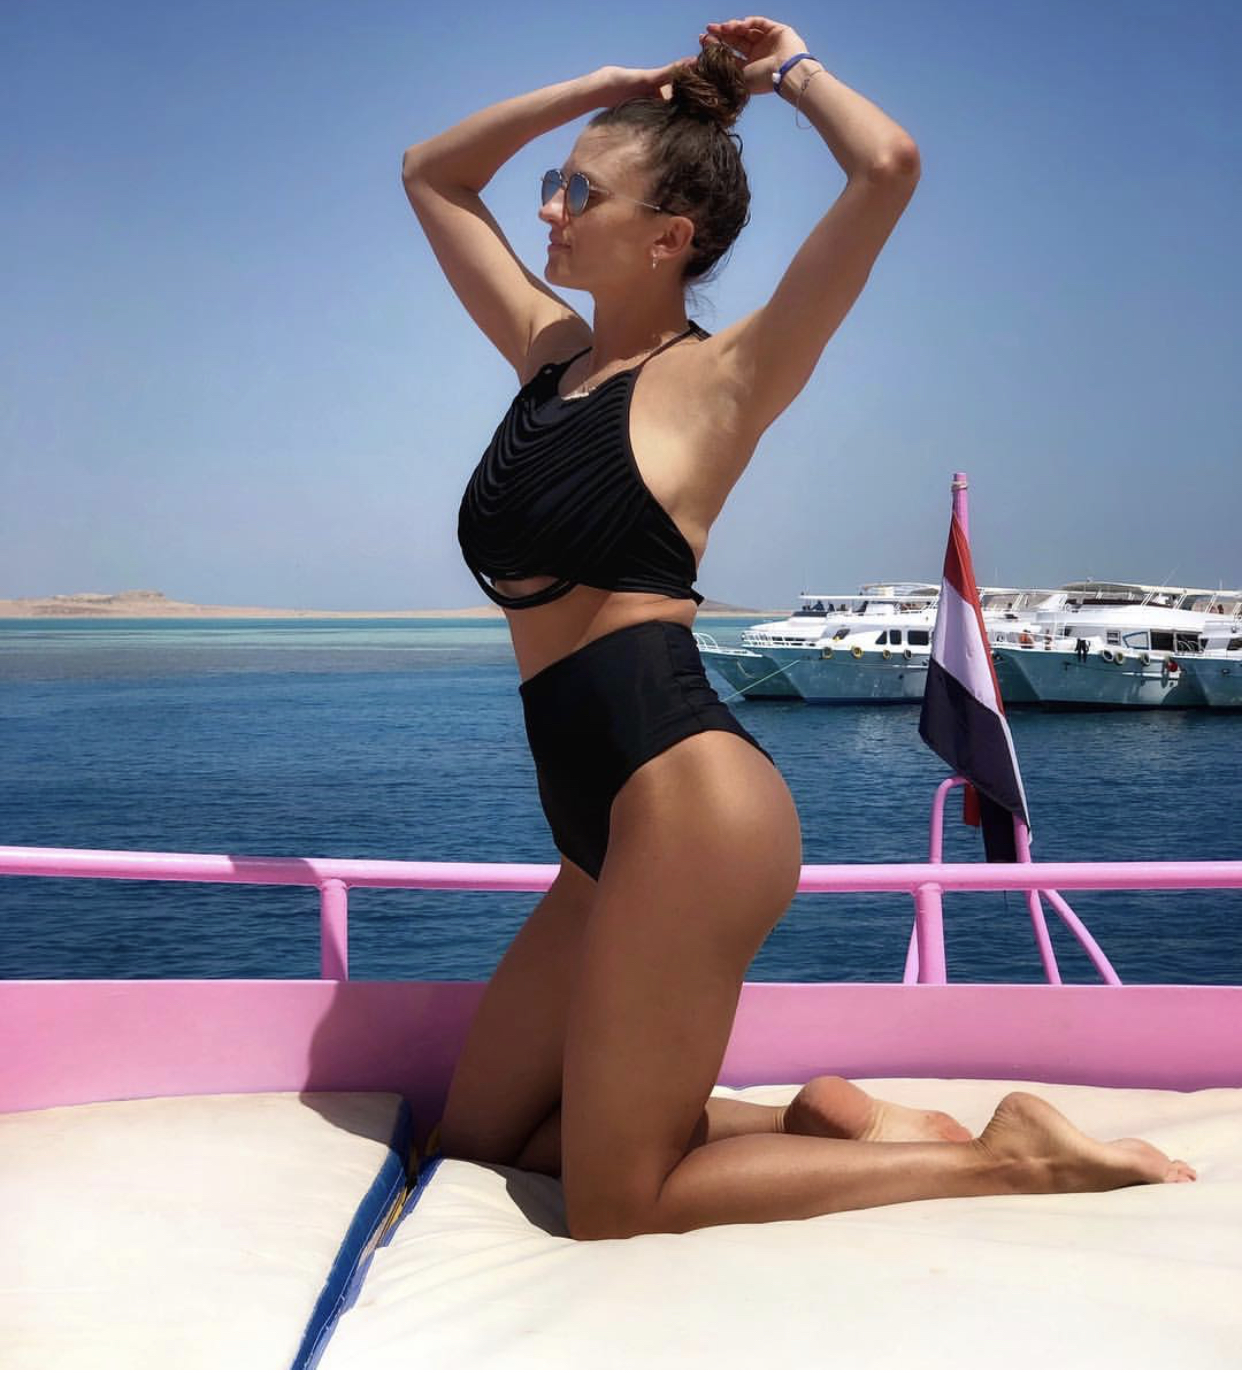 5b93d10b4d58b Mix & Match Swimwear - Украинский бренд, который включает в себе 2 линии: -  Swimwear (купальники и пляжная мода) - Homewear (одежда для дома).